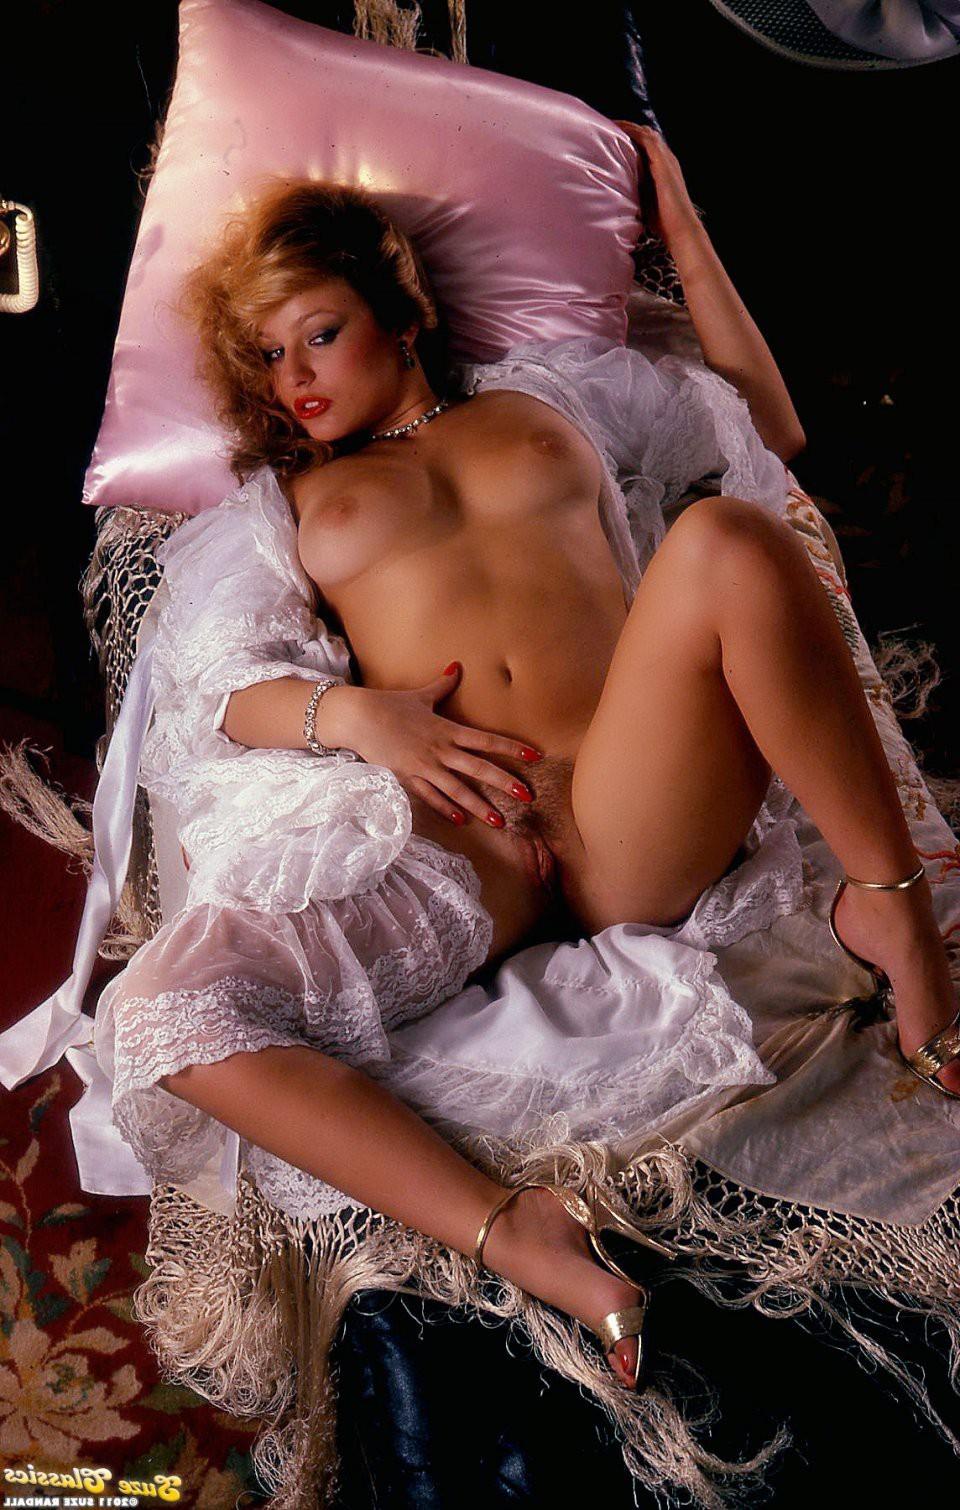 naked frances bavier – Anal